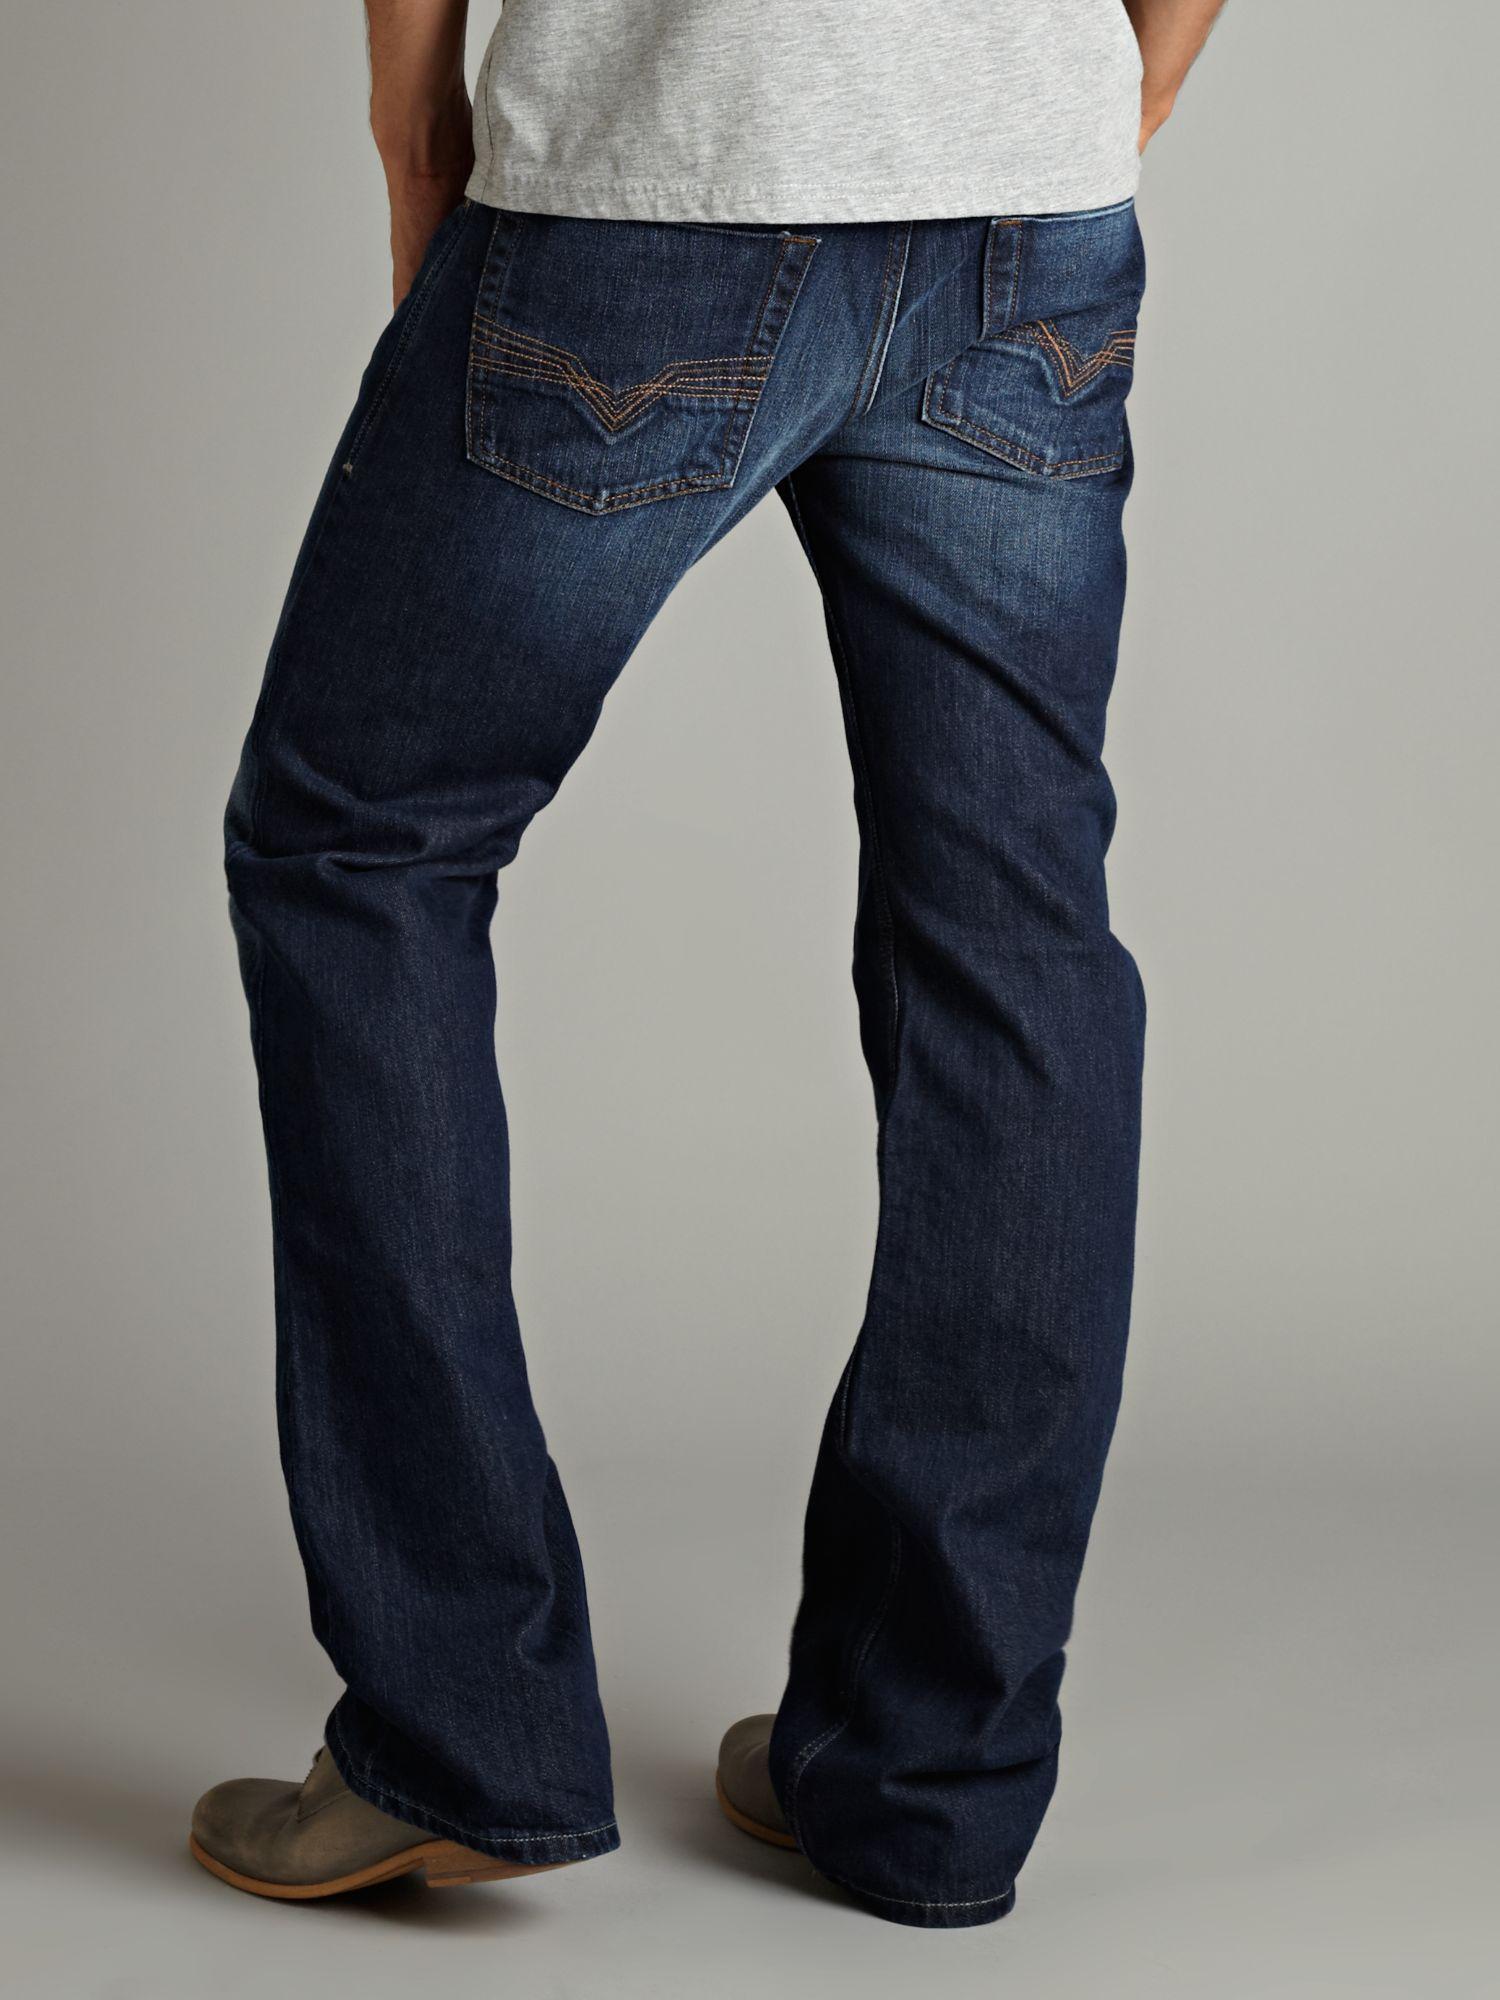 Diesel Zatiny 8J4 Dark Wash Bootcut Jeans in Blue for Men ... Diesel Jeans Men Bootcut